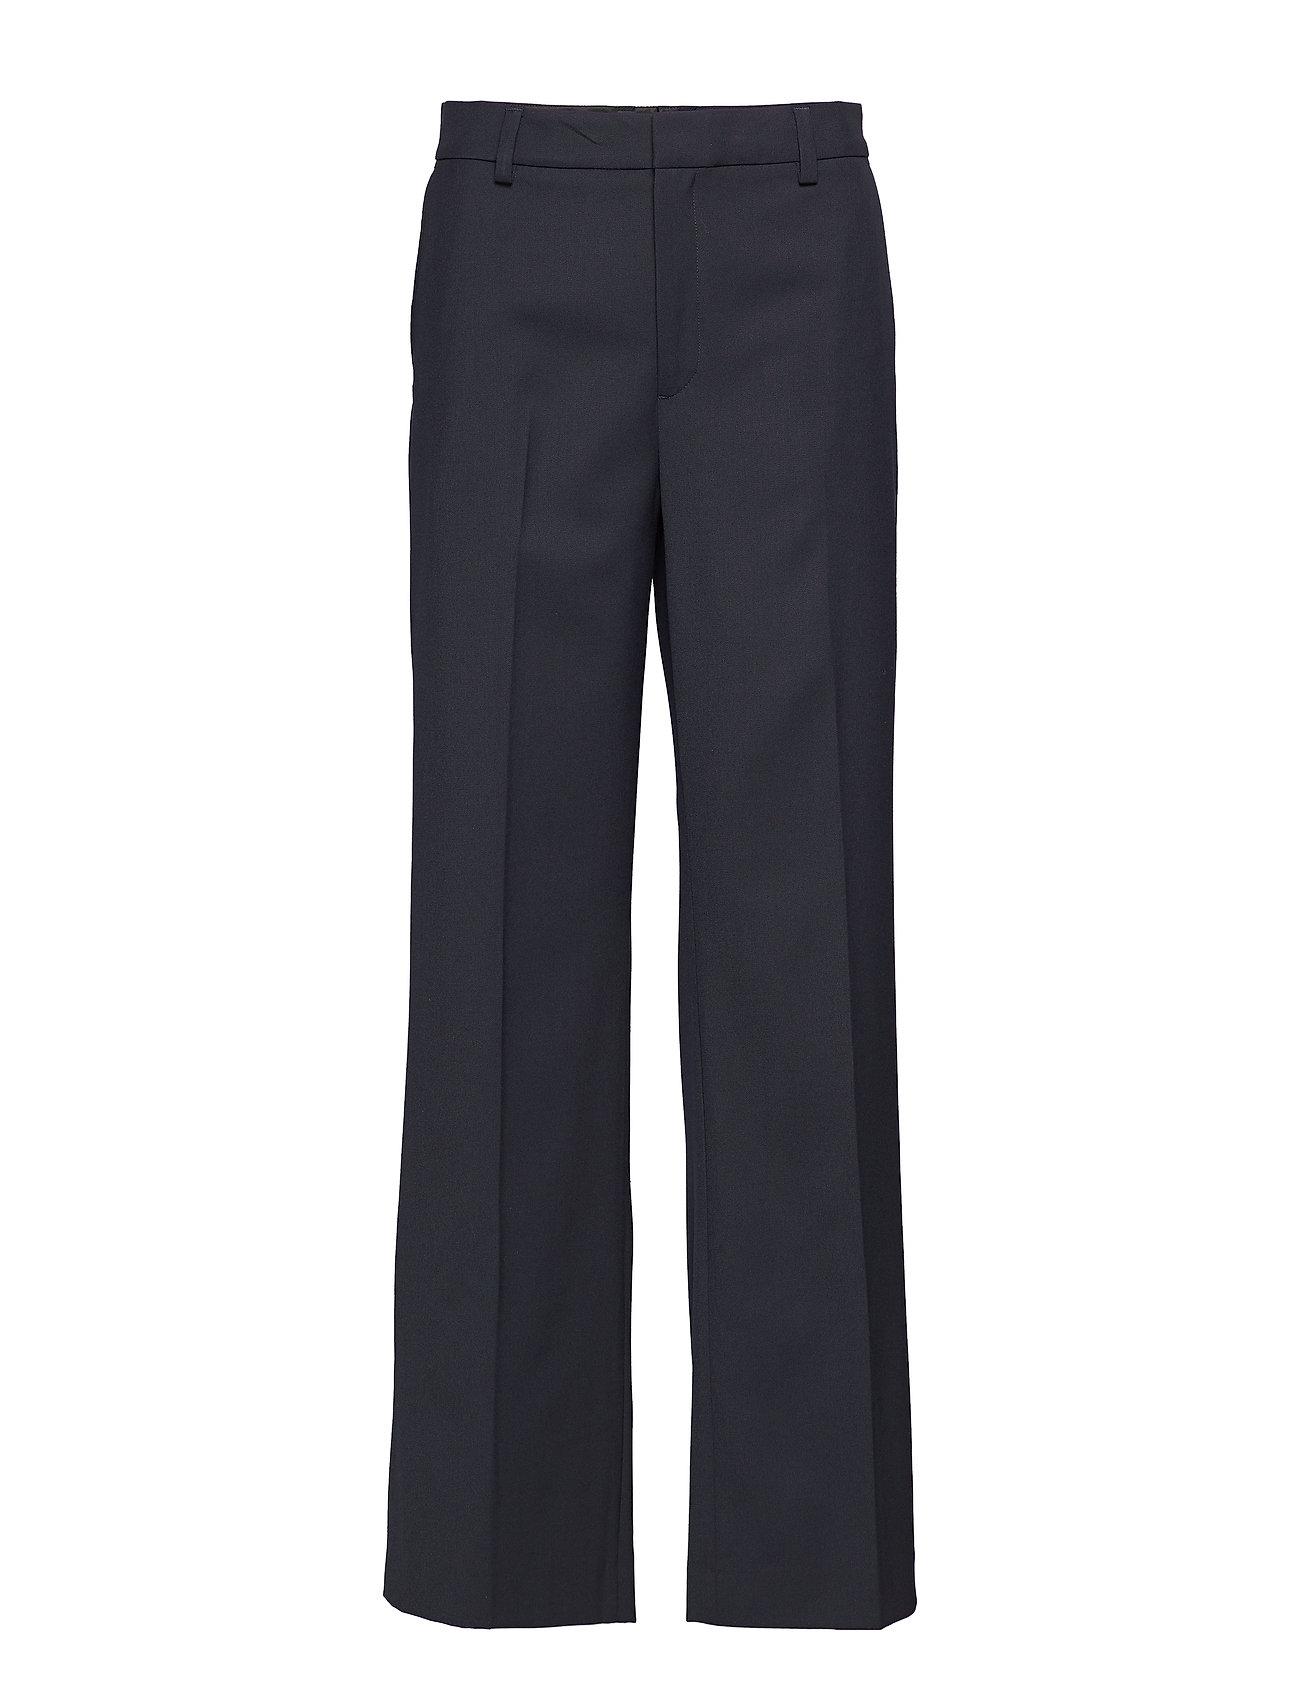 Image of Hutton Trousers Bukser Med Lige Ben Sort FILIPPA K (3105944359)